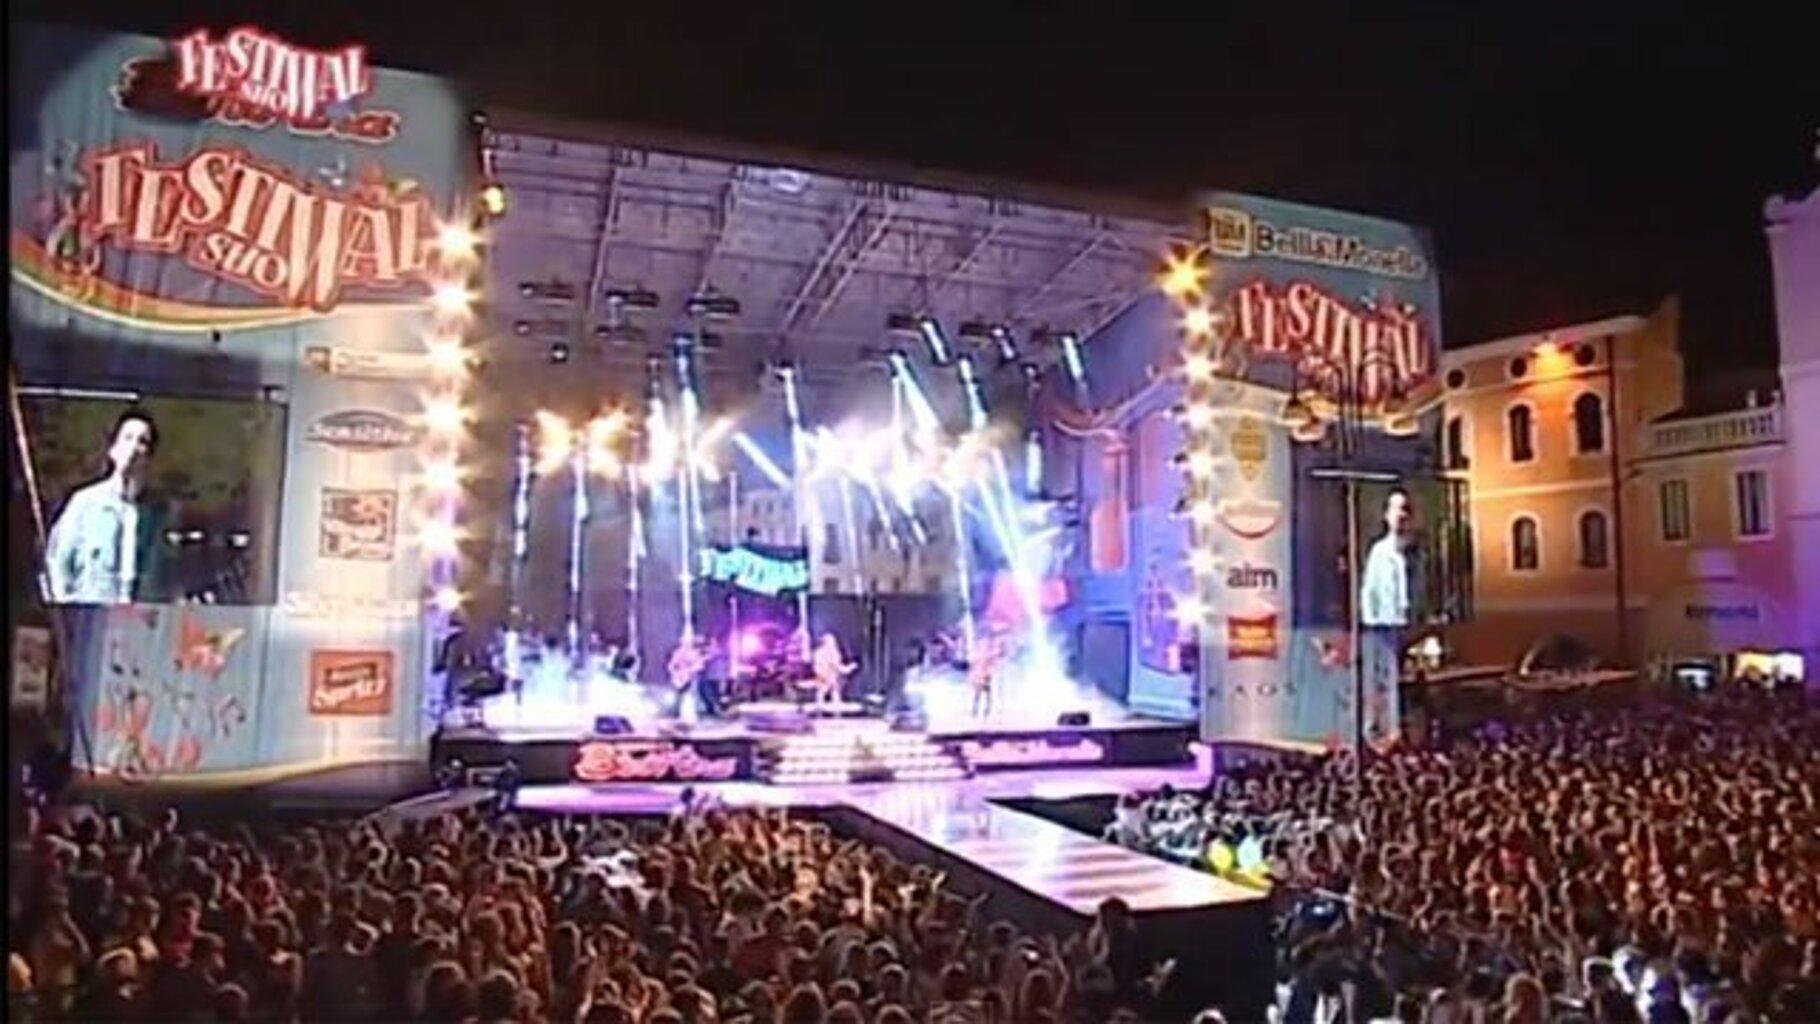 The Sun Festival Show Live